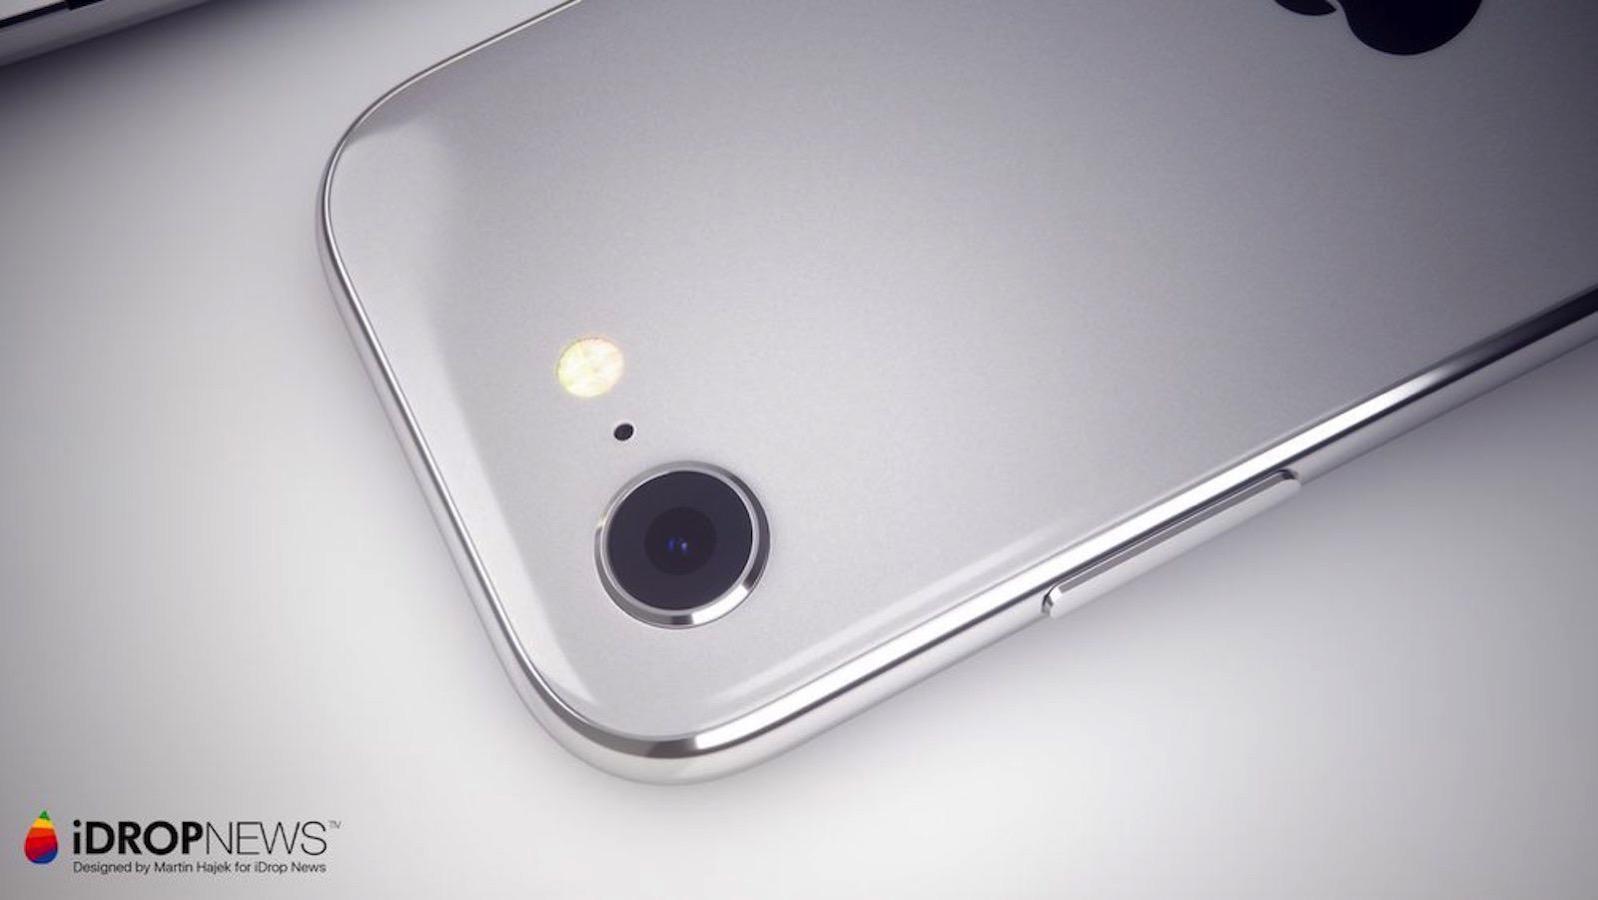 Curved-iPhone-Concept-iDrop-News-x-Martin-Hajek-4.jpg